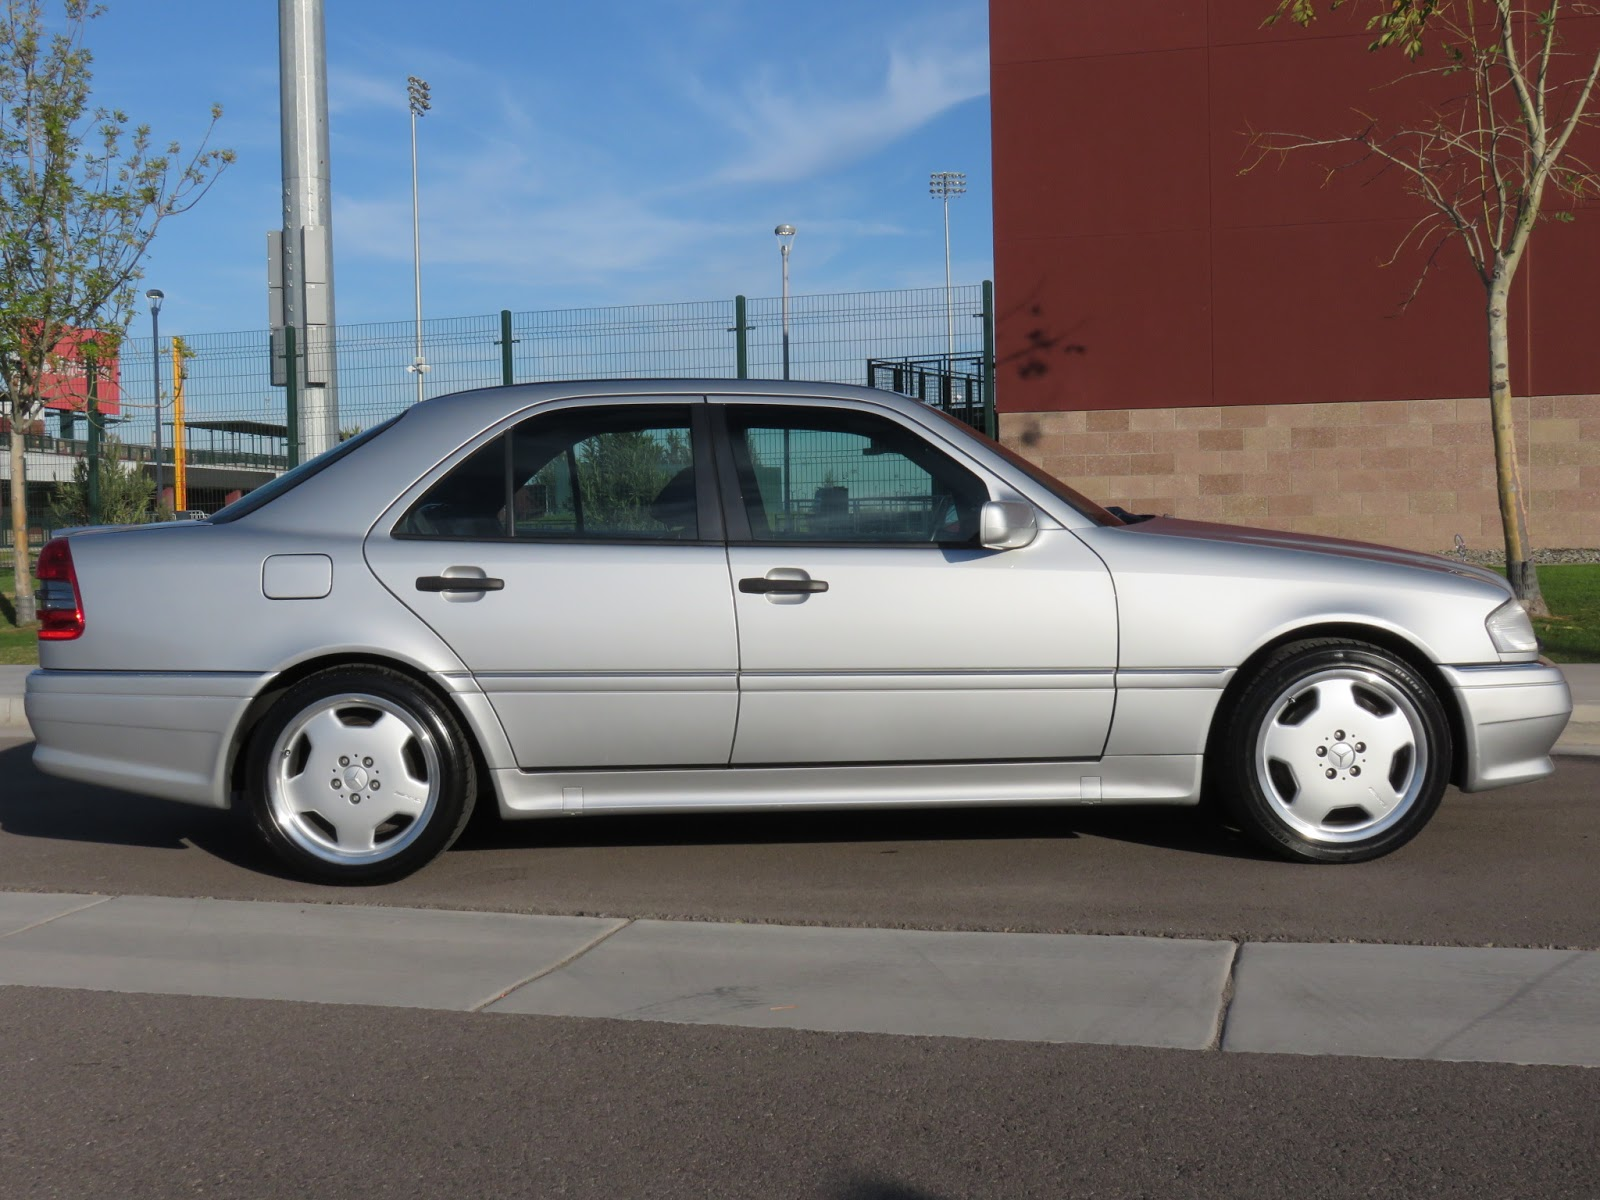 1996 mercedes benz w202 c36 amg benztuning for Mercedes benz c class w202